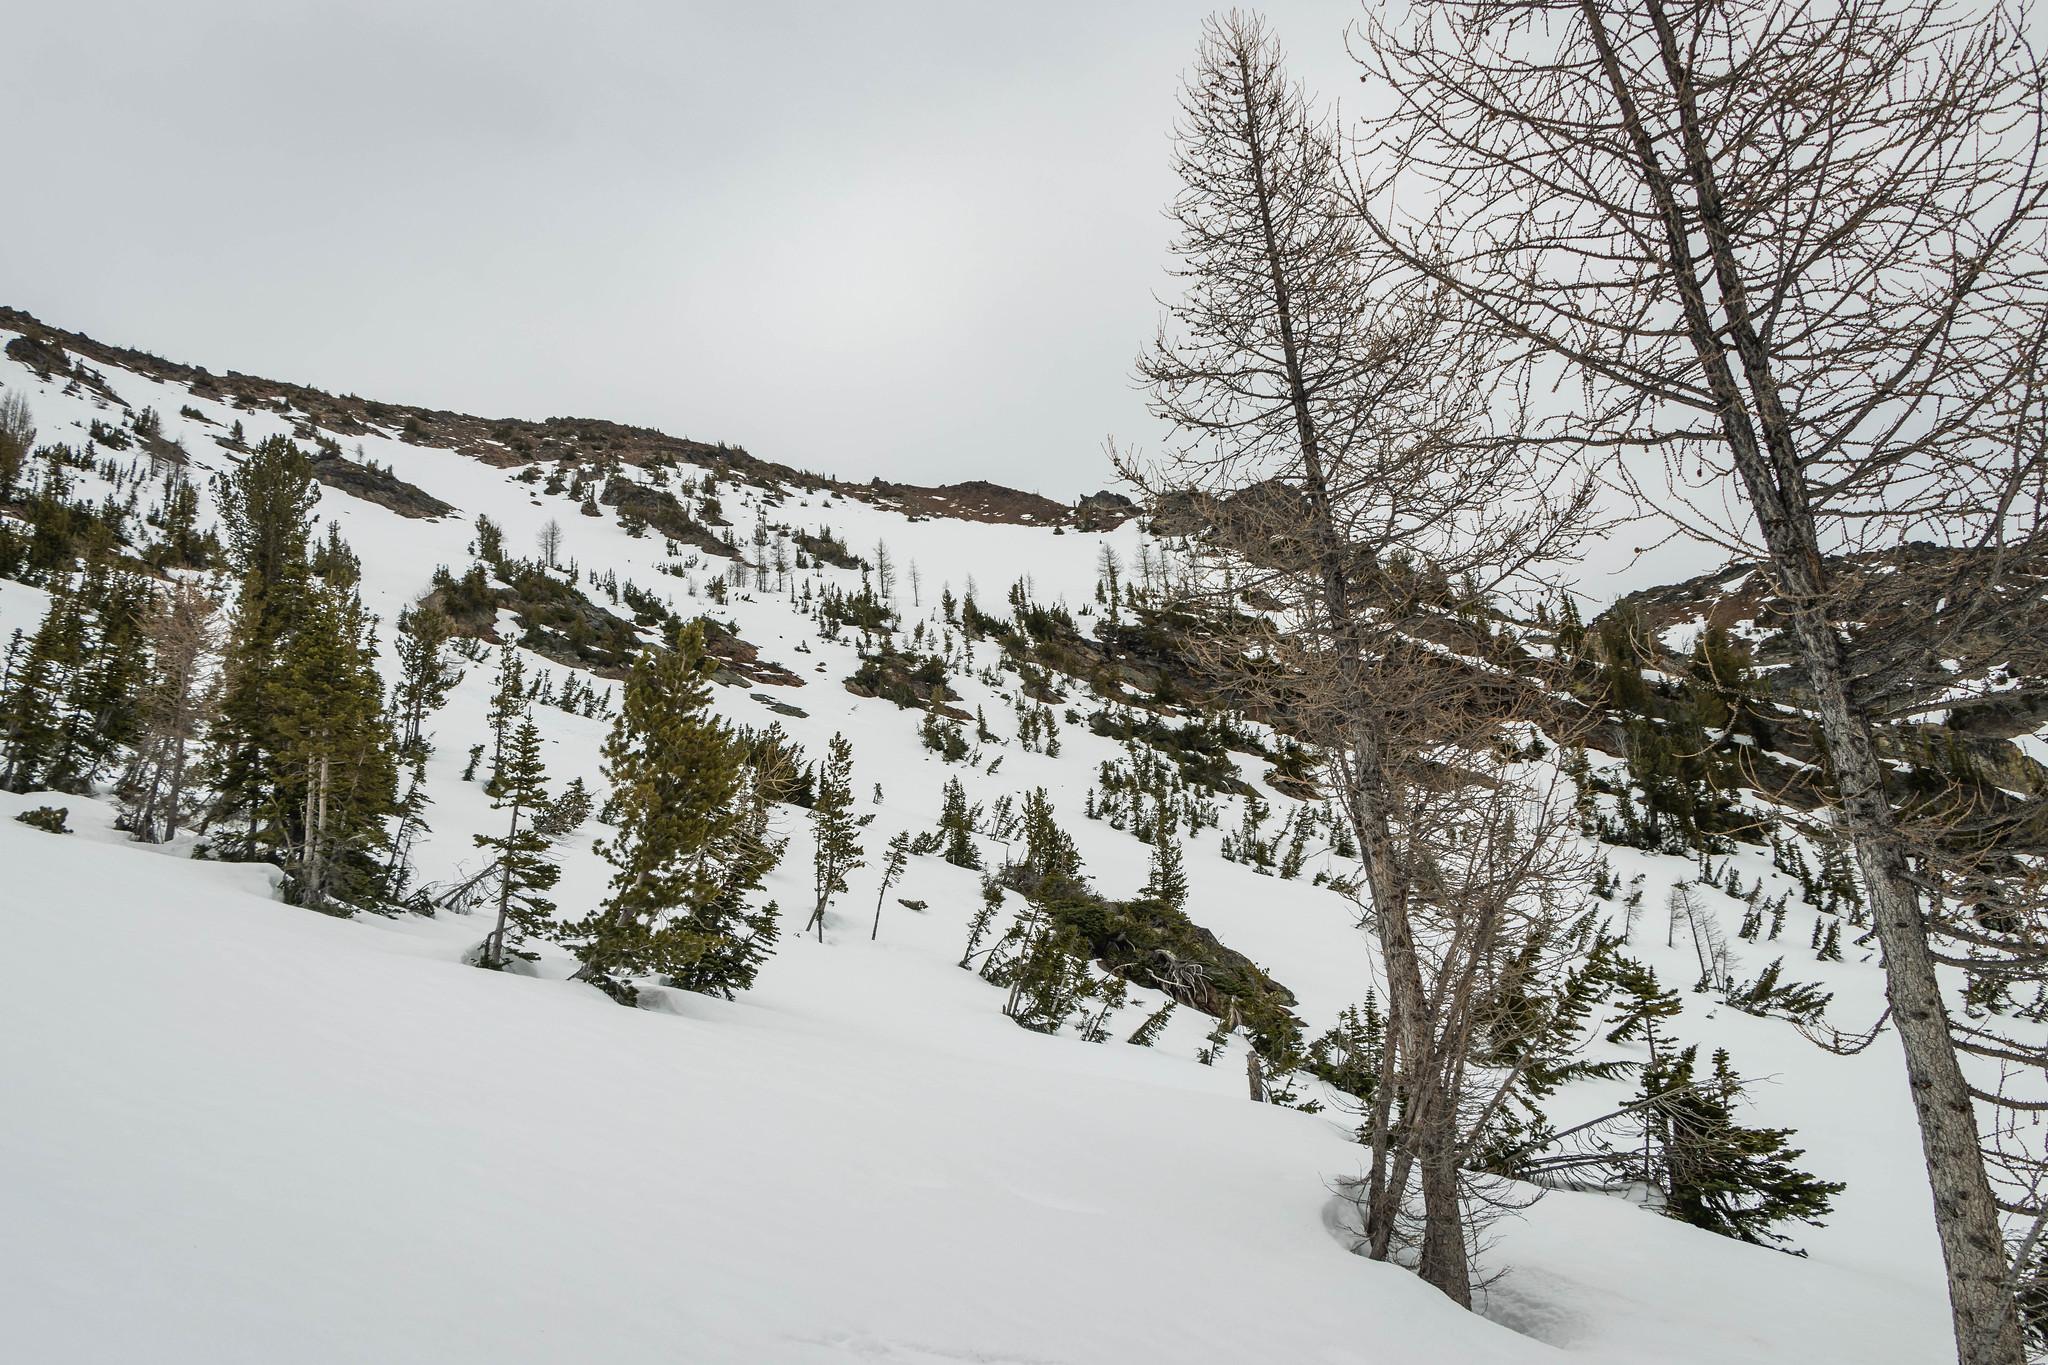 Mother Lode Peak 1000 feet above